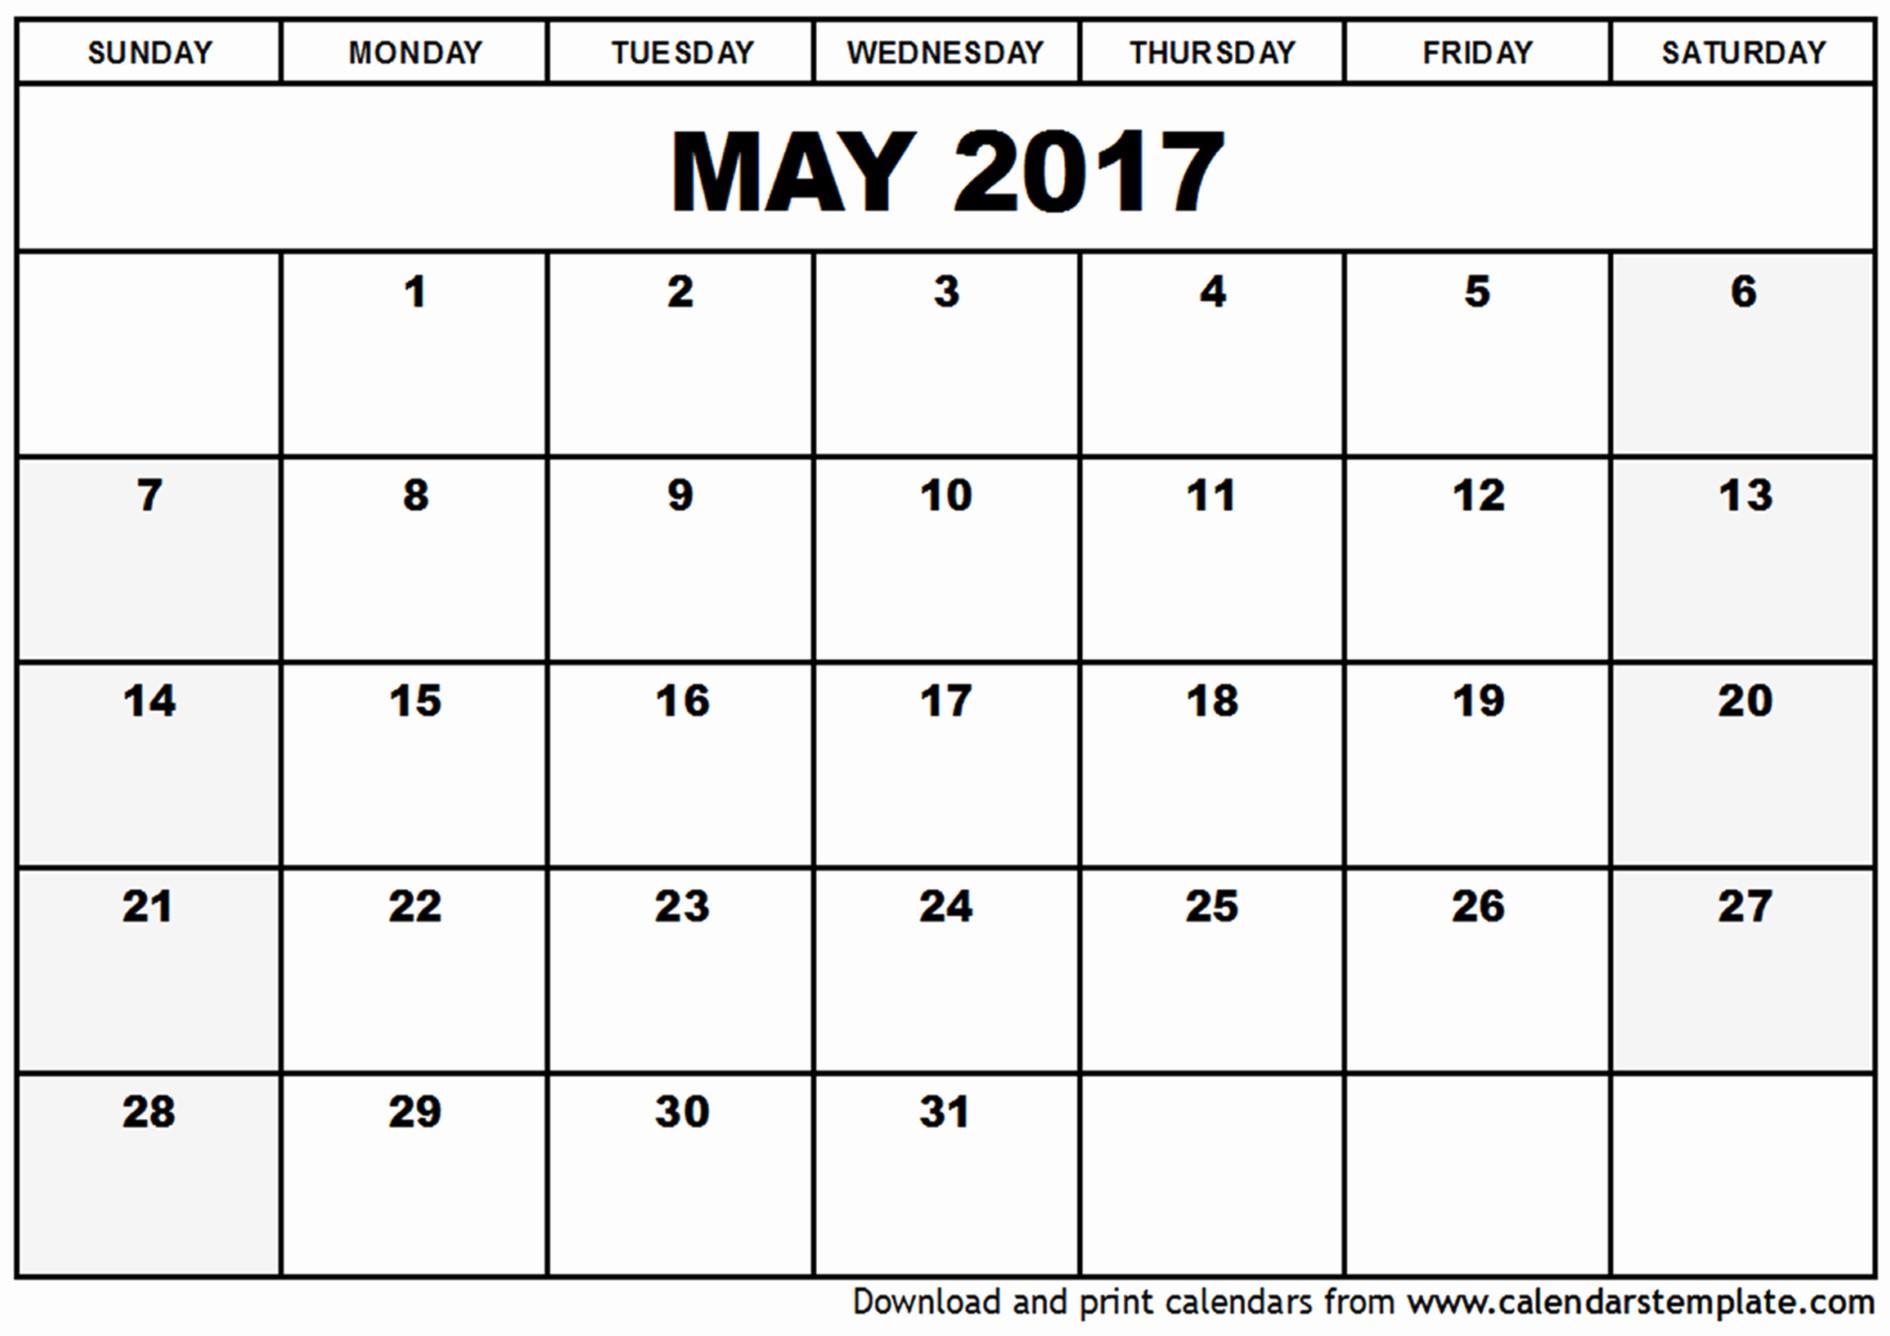 Blank May Calendar 2017 Printable Elegant May 2017 Calendar Template